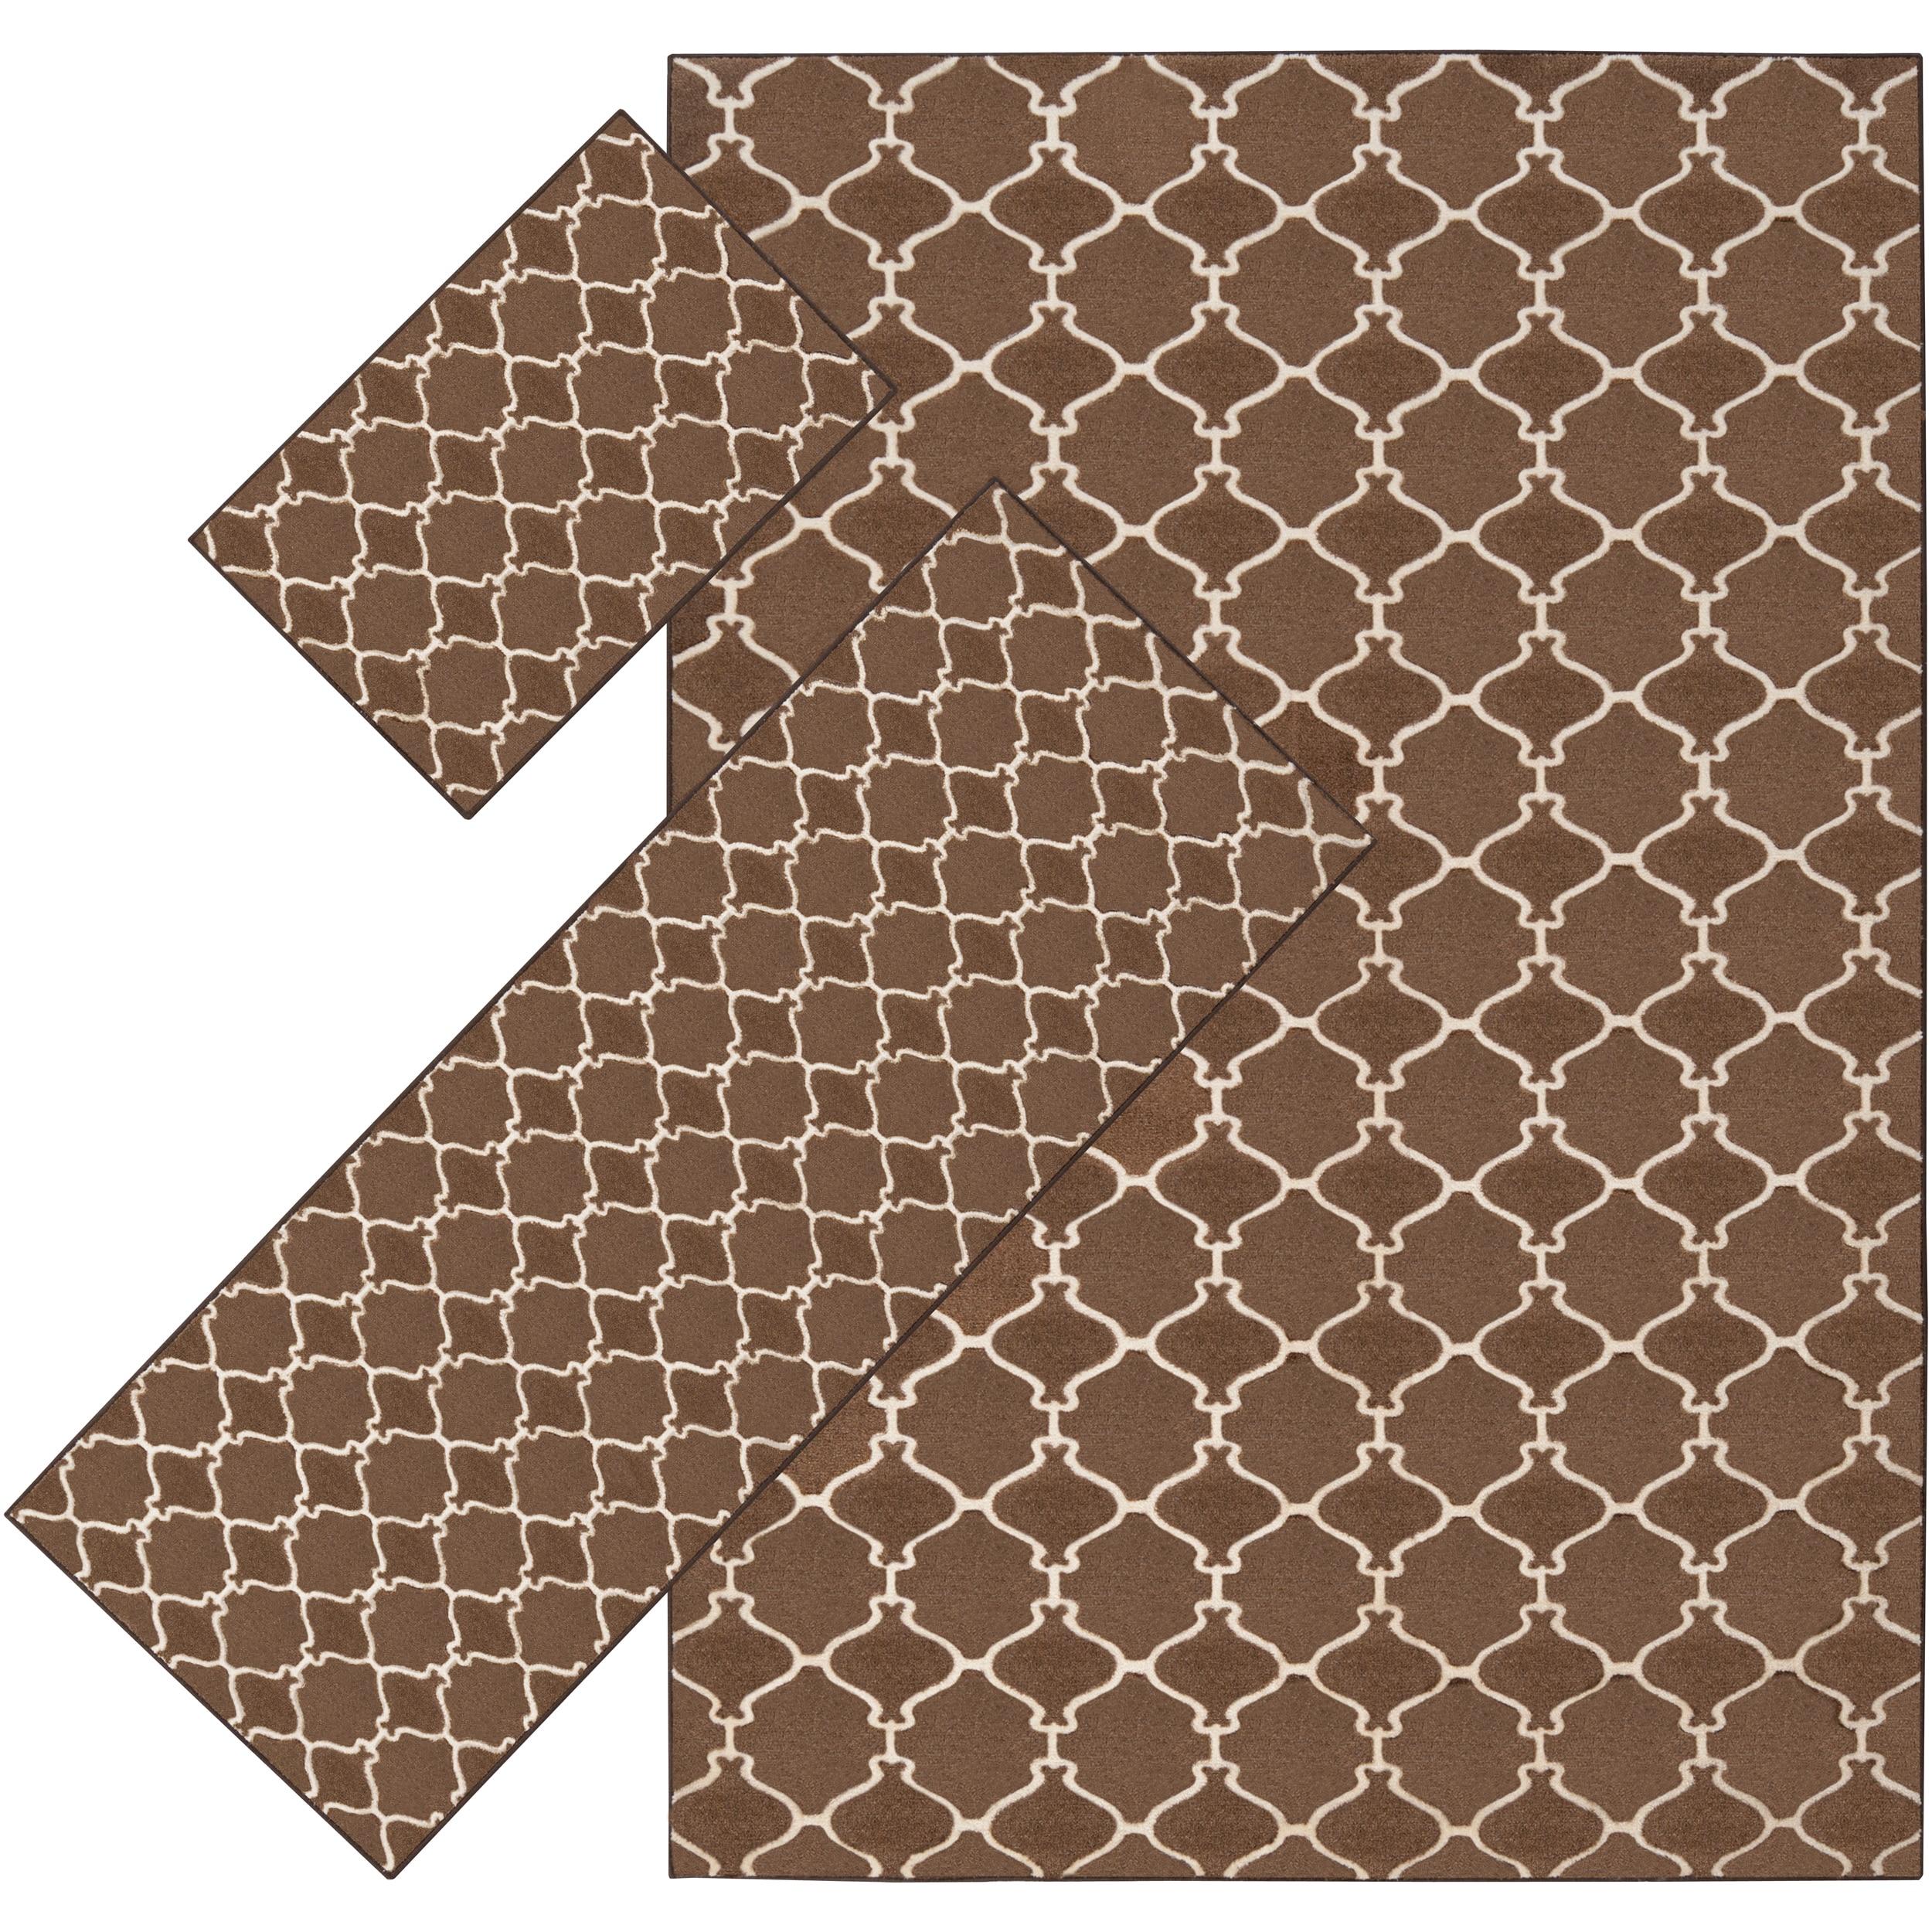 Woven Brown Tabluar 3-piece Rug Set - 5' x 8'